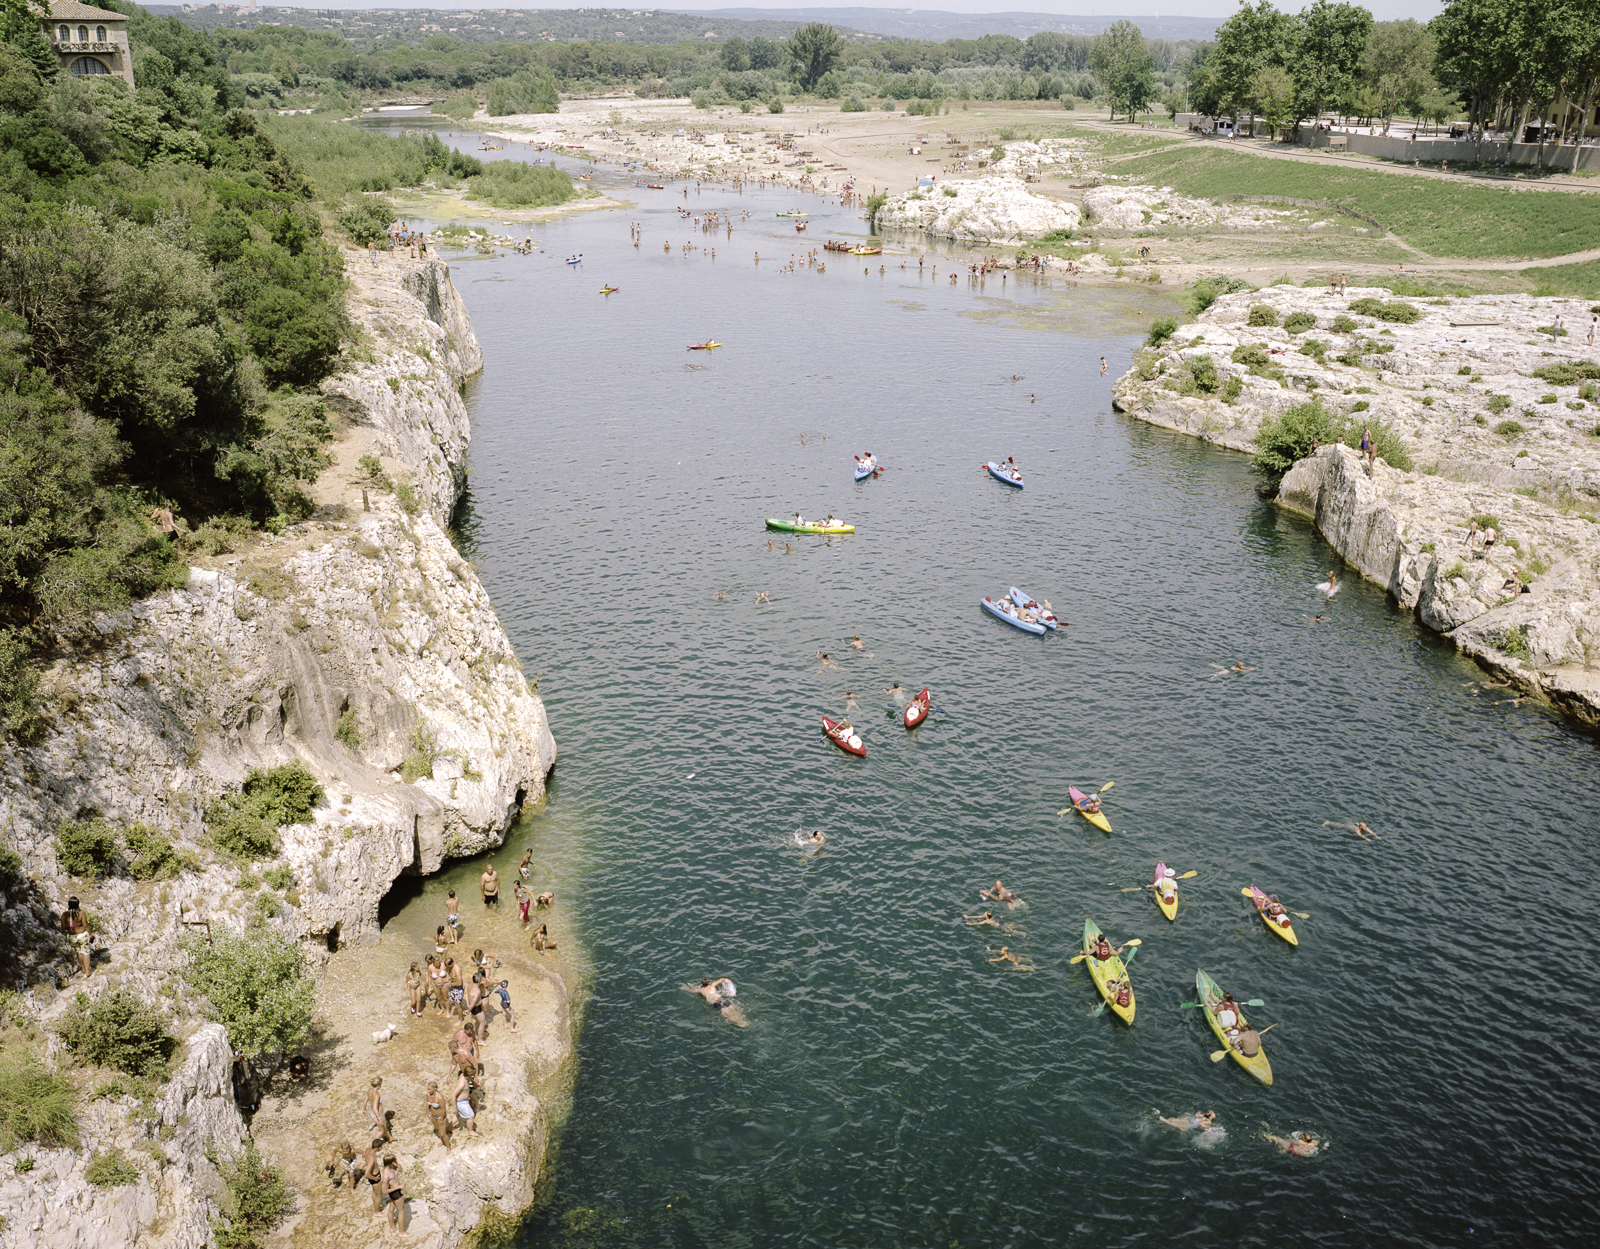 Gard river, France